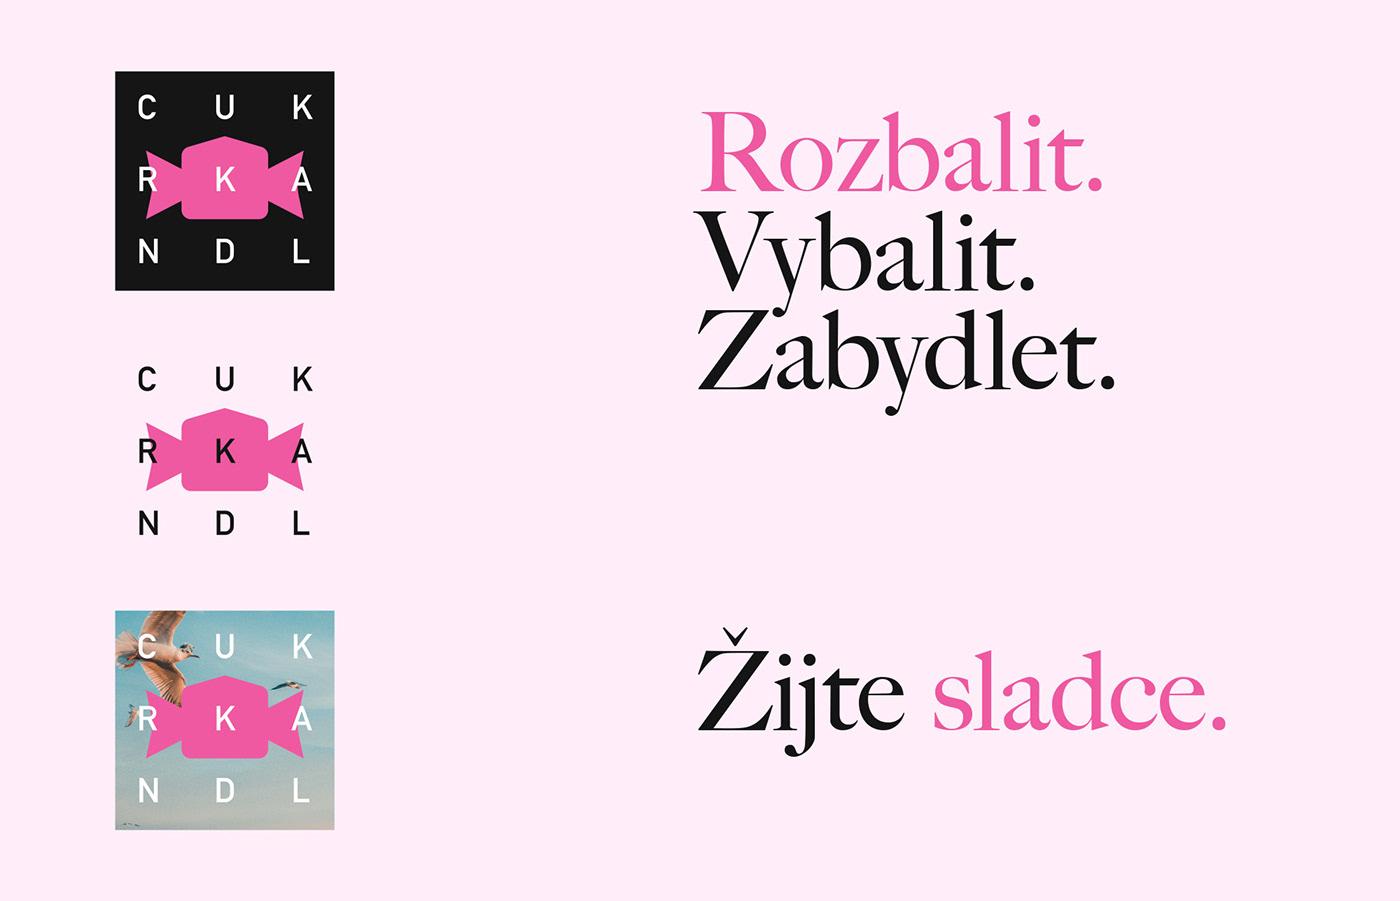 art direction  branding  concept Corporate Identity graphic design  logo Praha rebranding visual identity